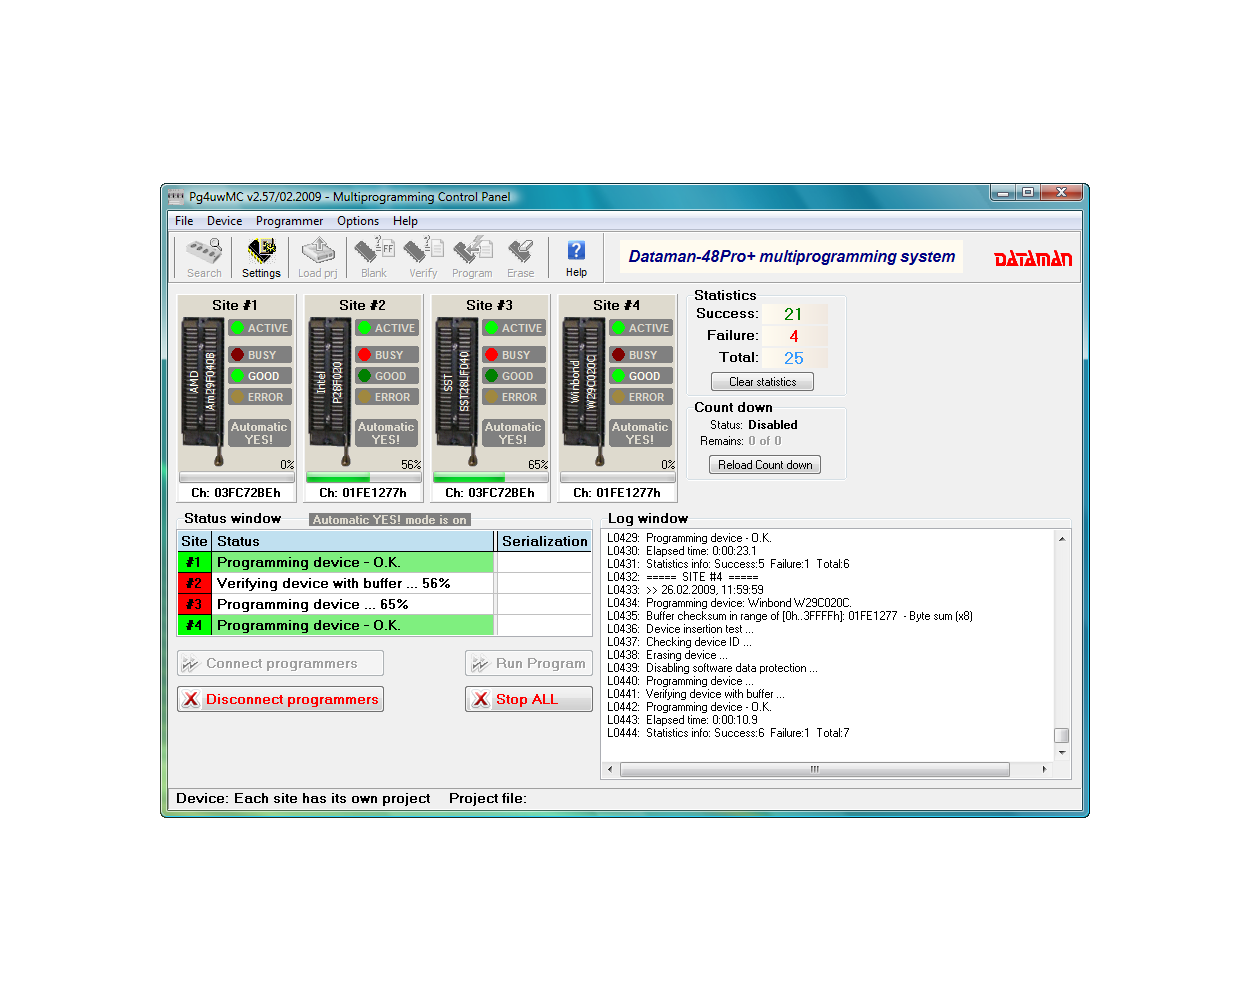 Device Programming / Verification